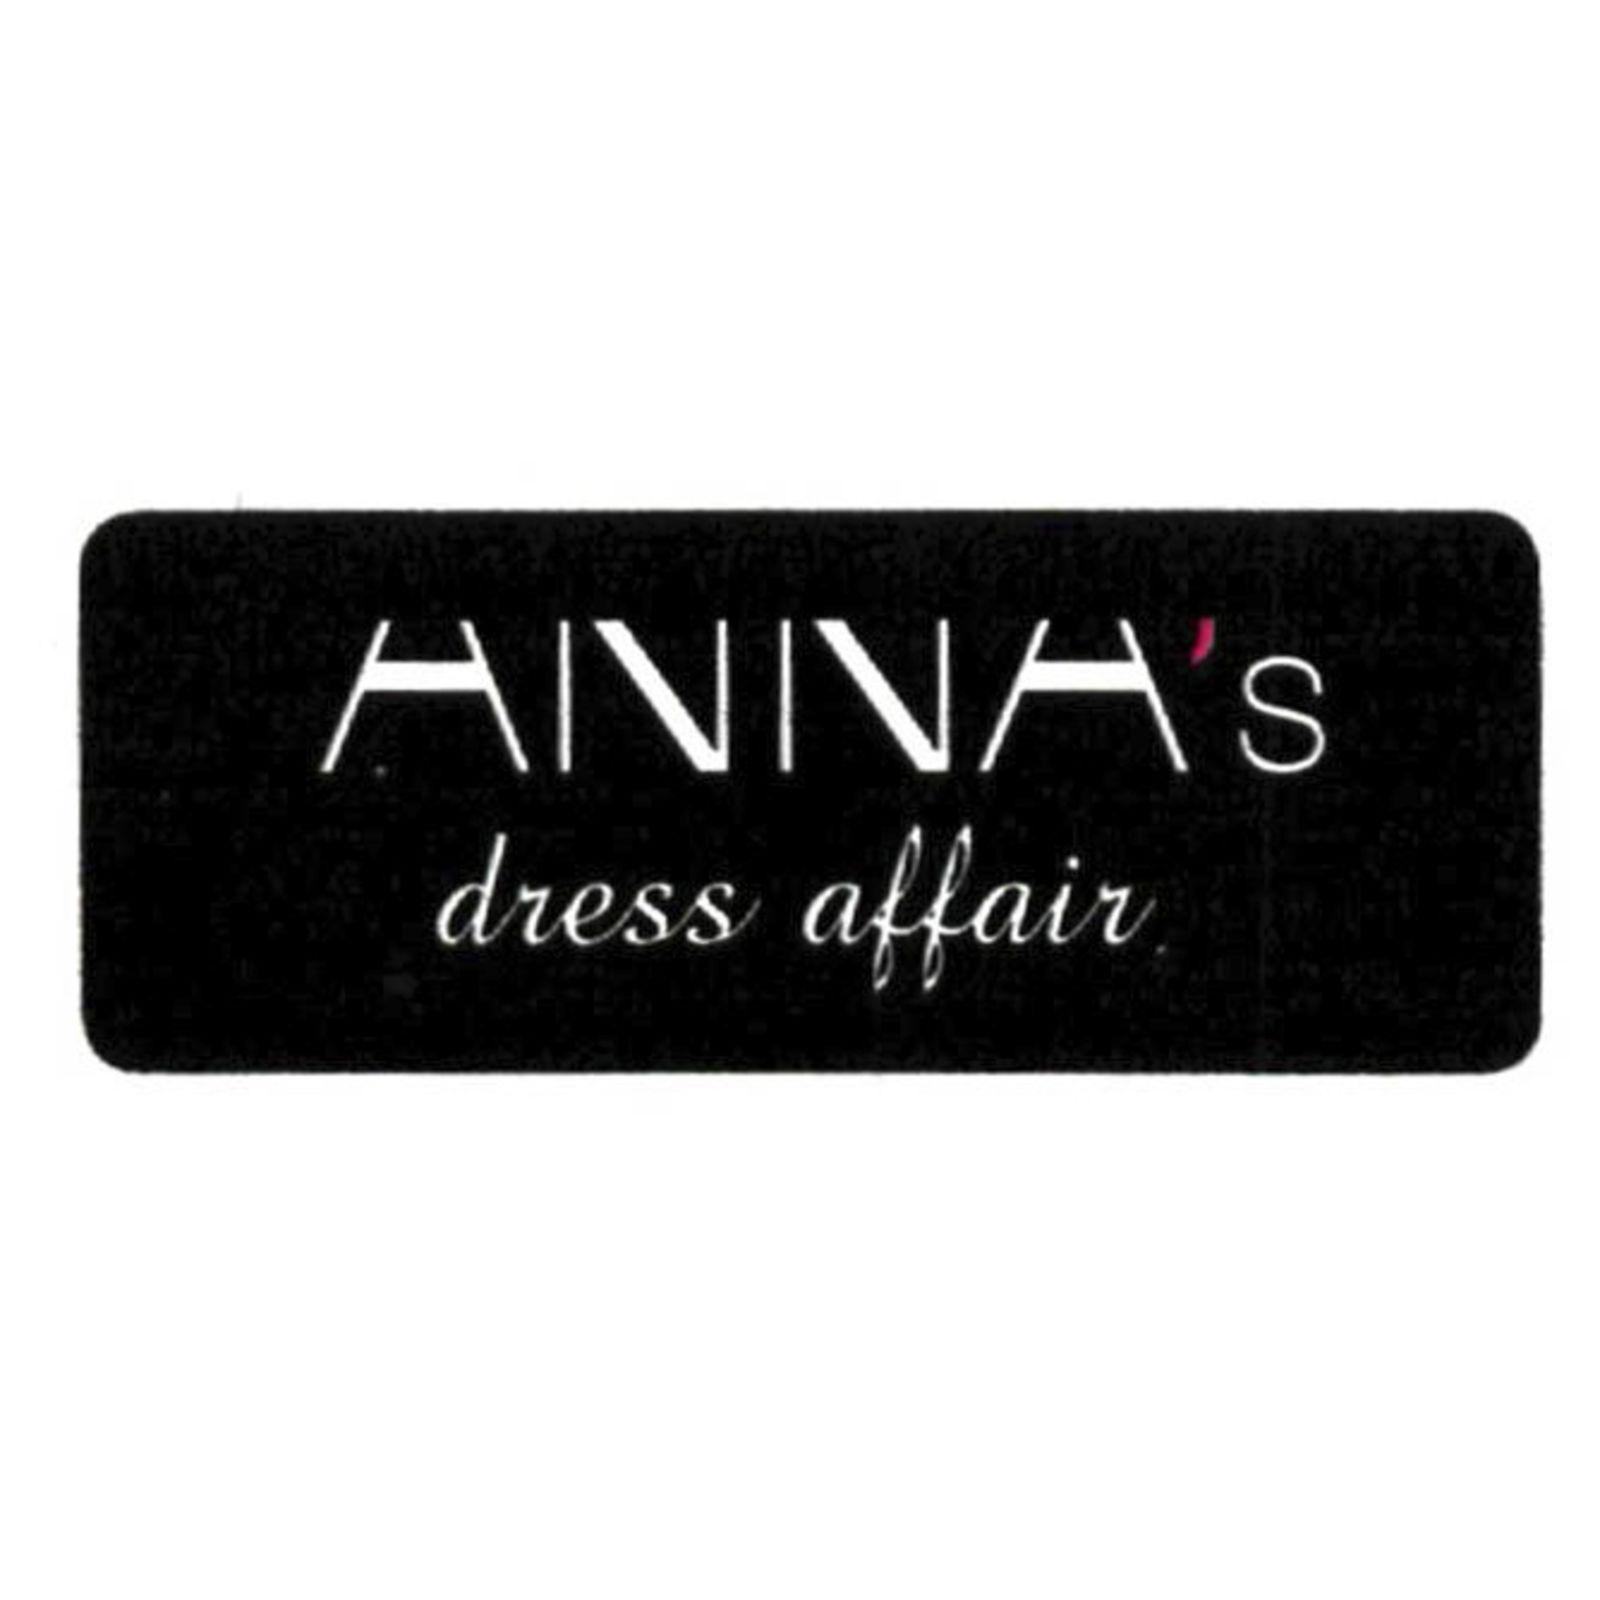 ANNA's dress affair